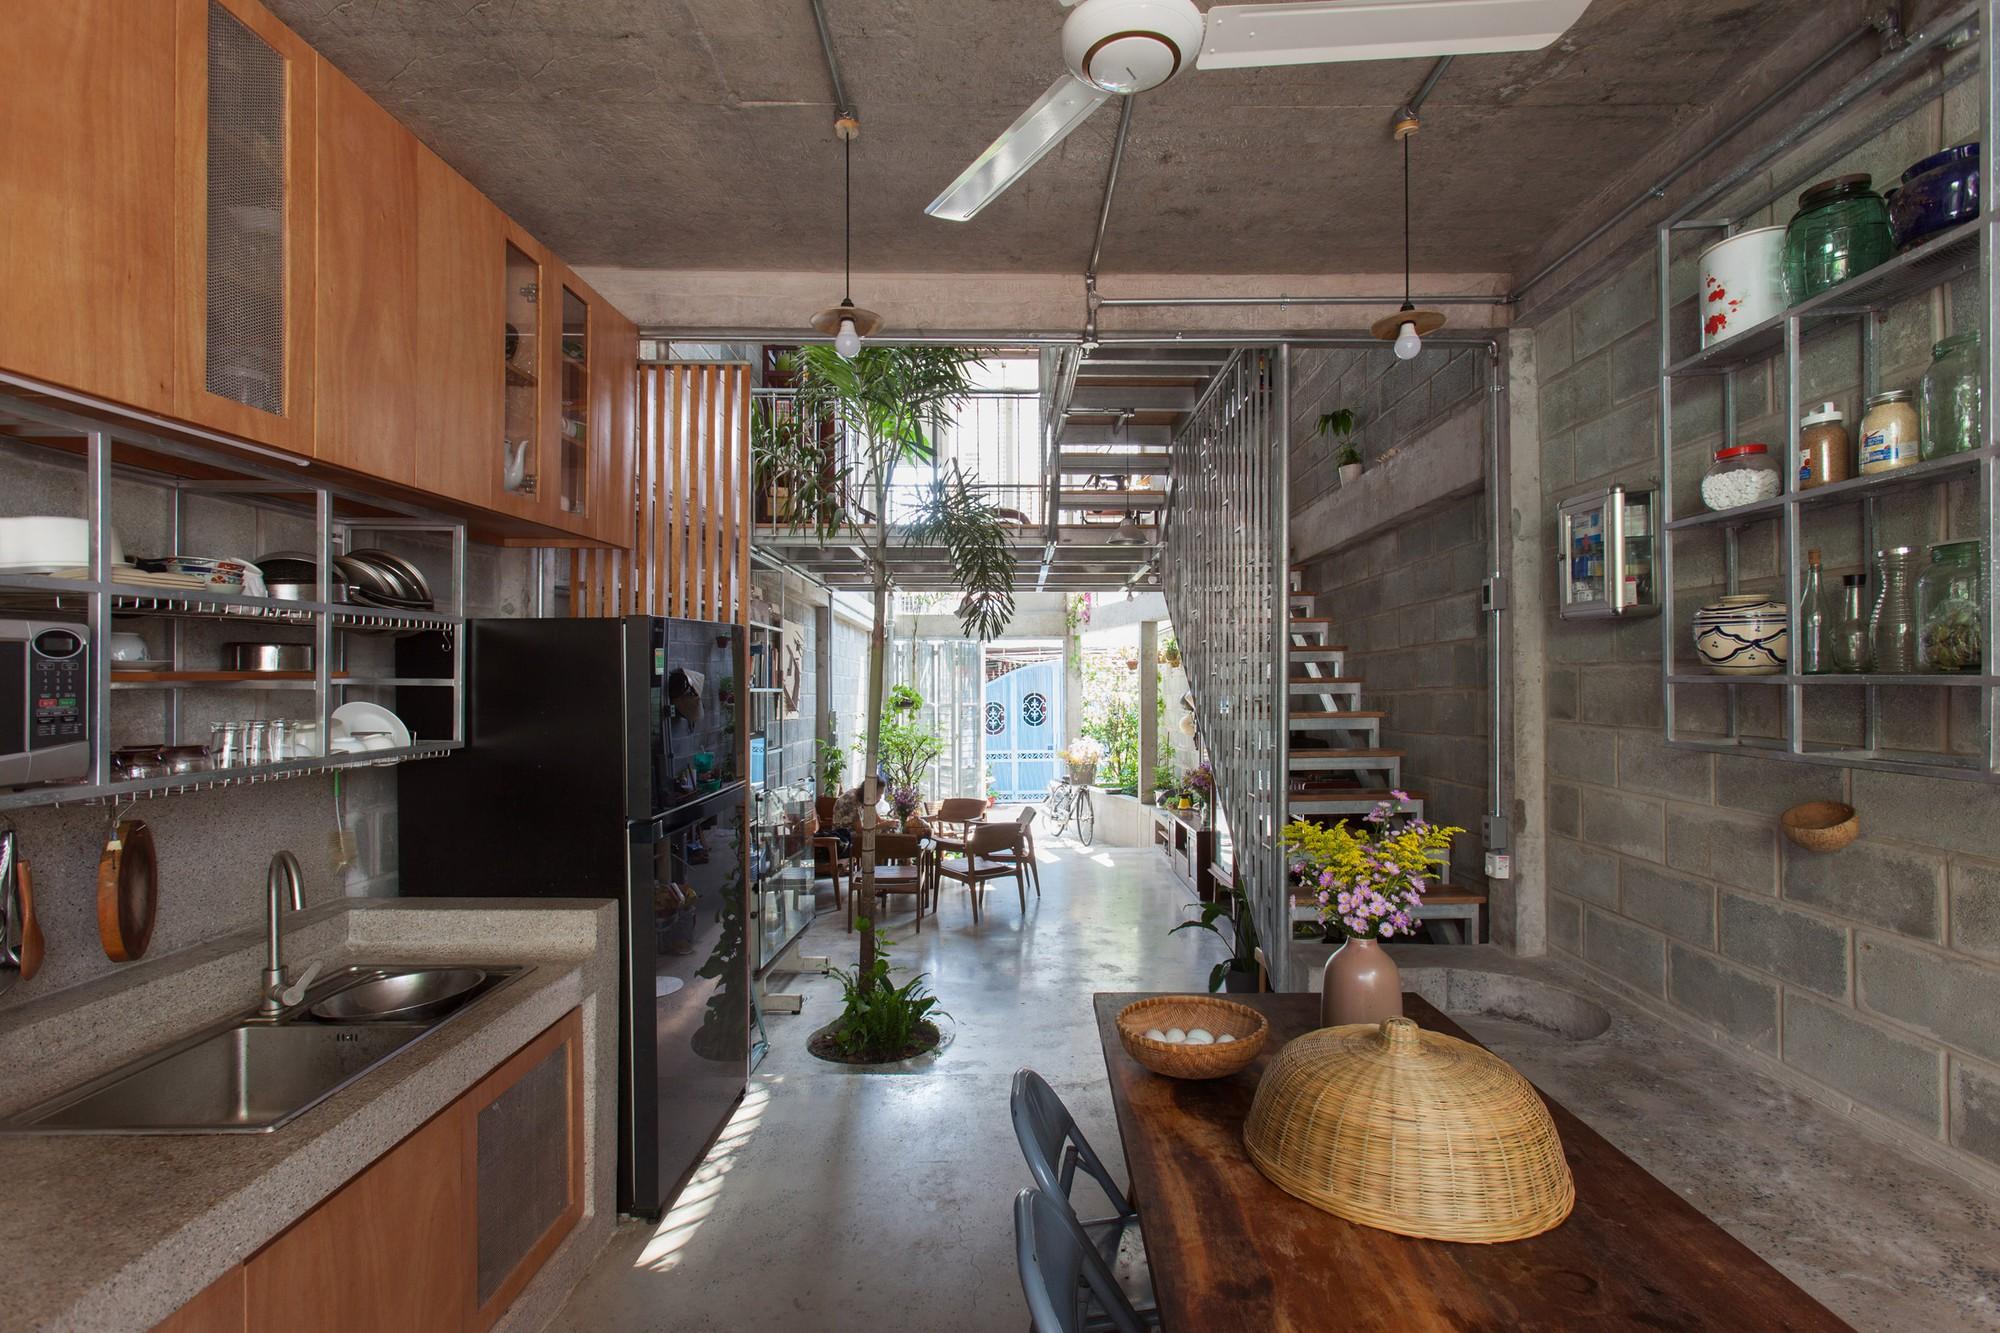 k59-atelier-home-studio-architecture-residential-self-designed-studios-vietnam_dezeen_2364_col_9